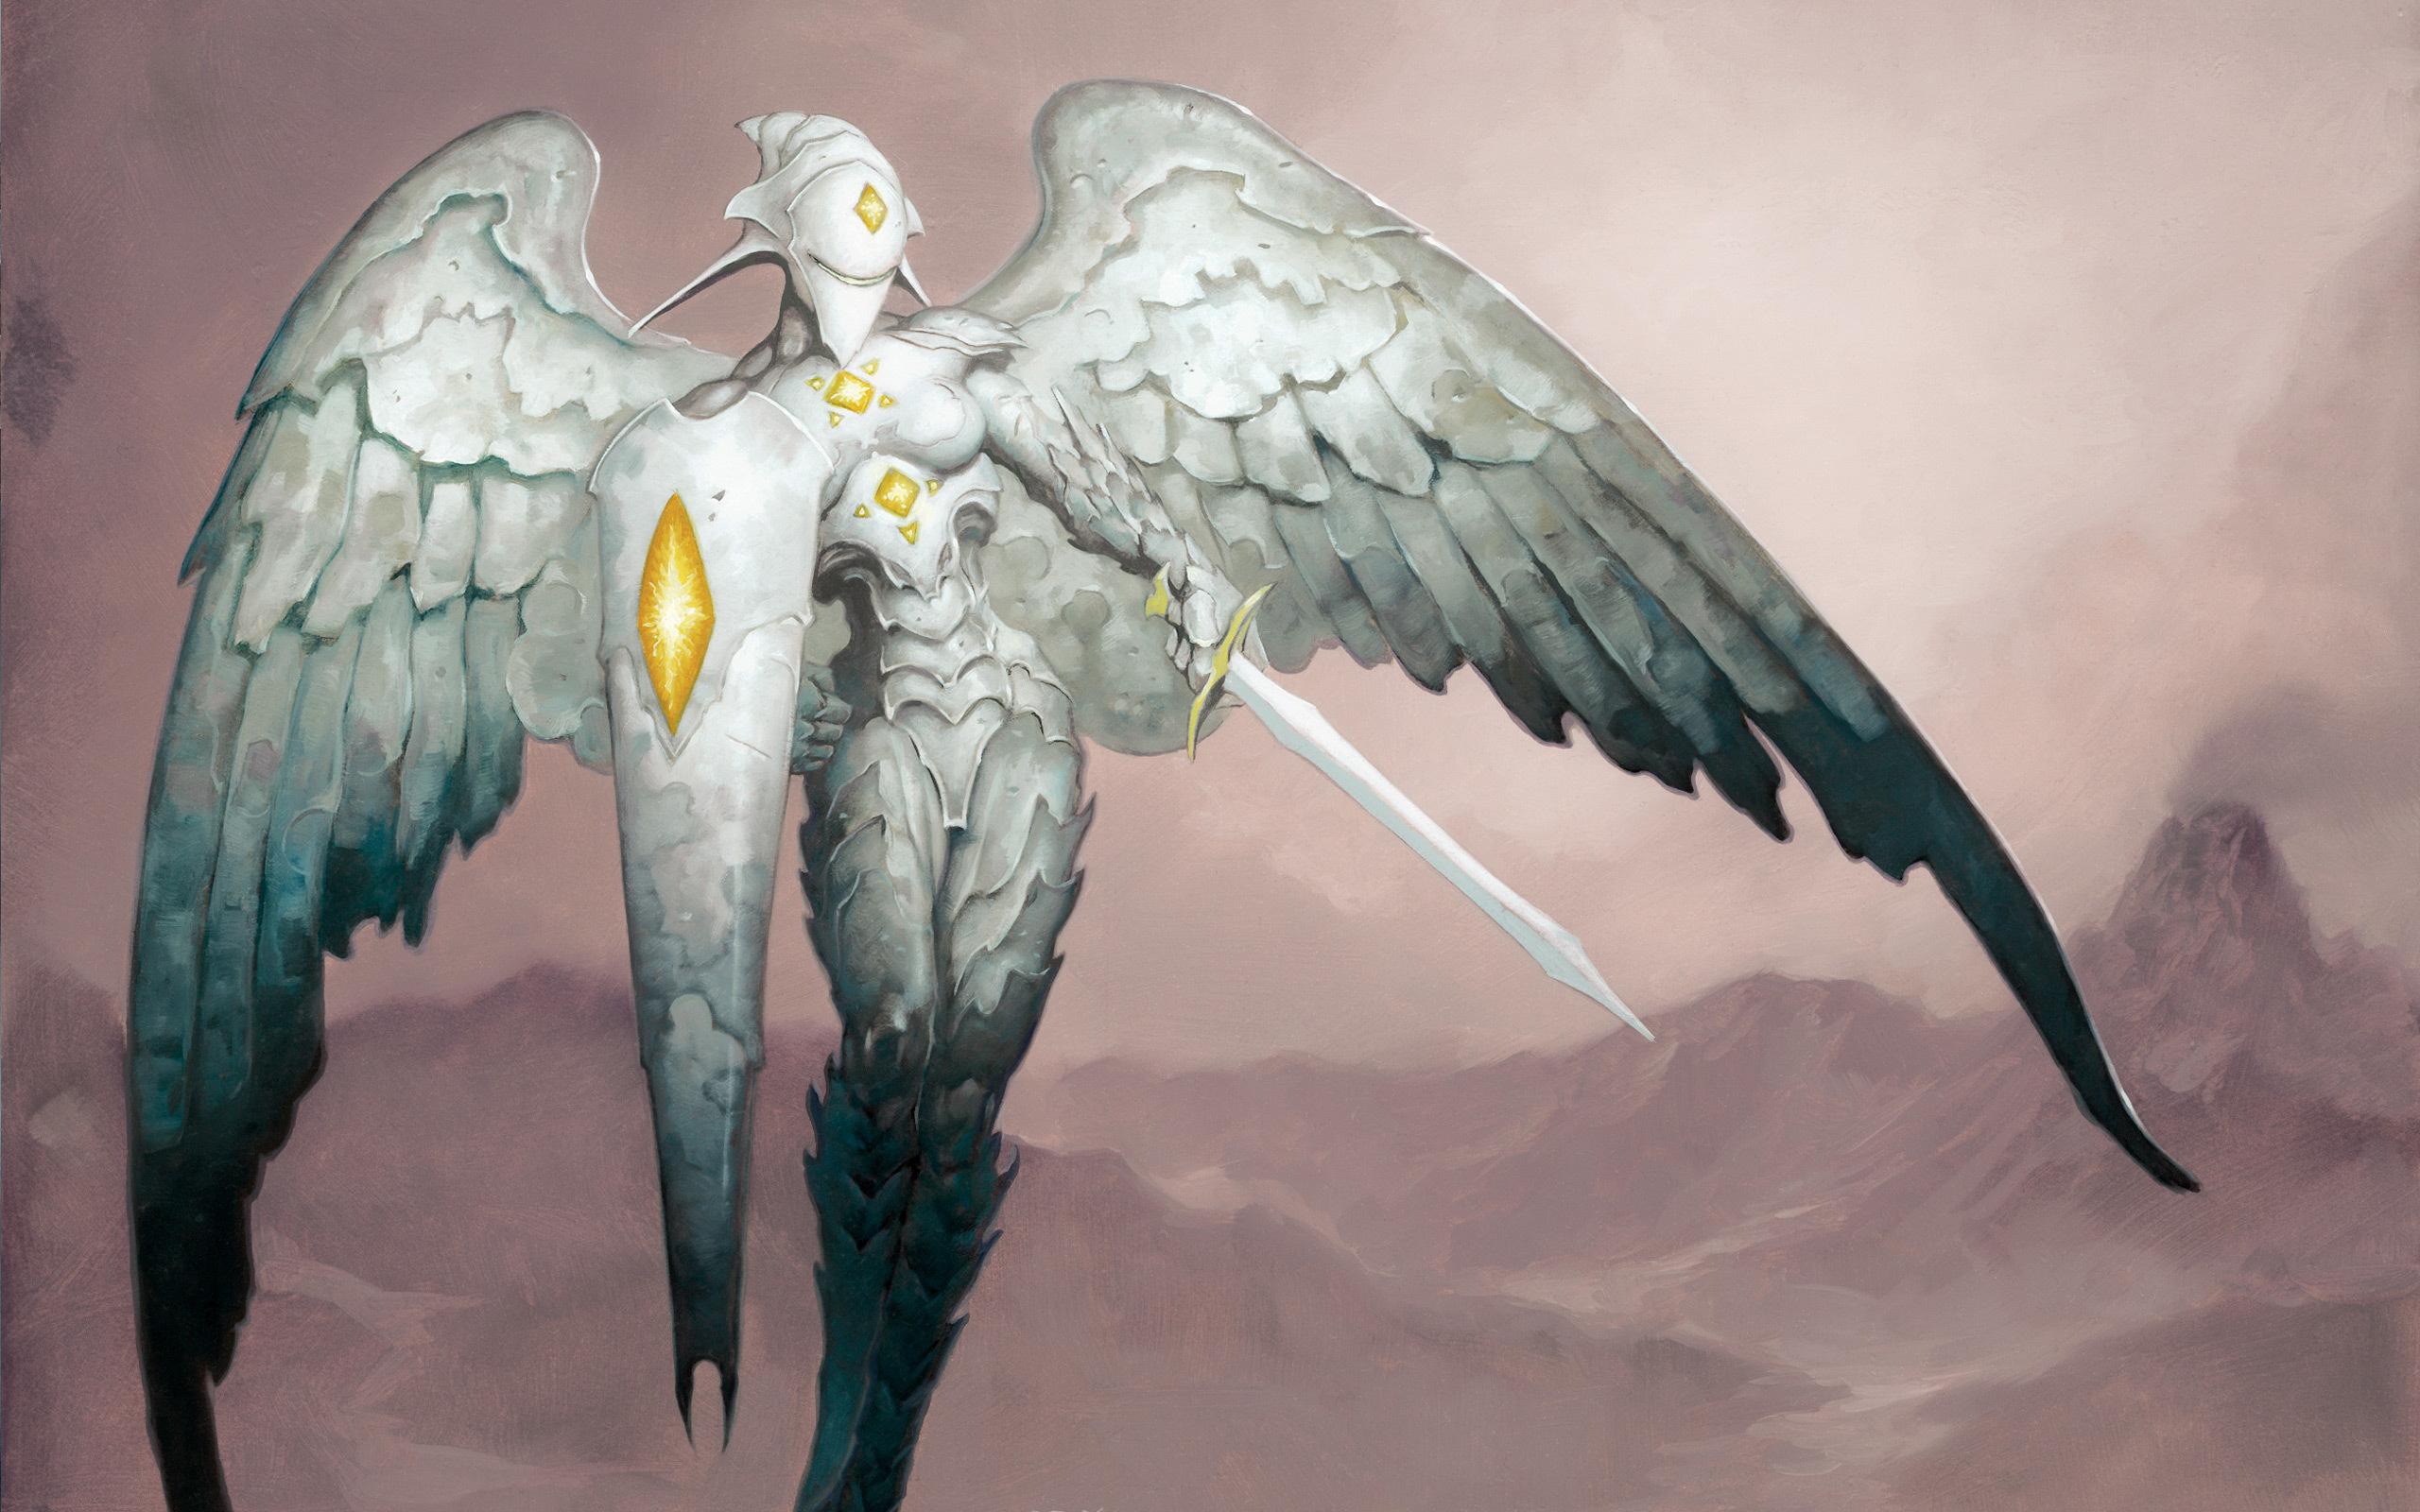 Angels Magic The Gathering